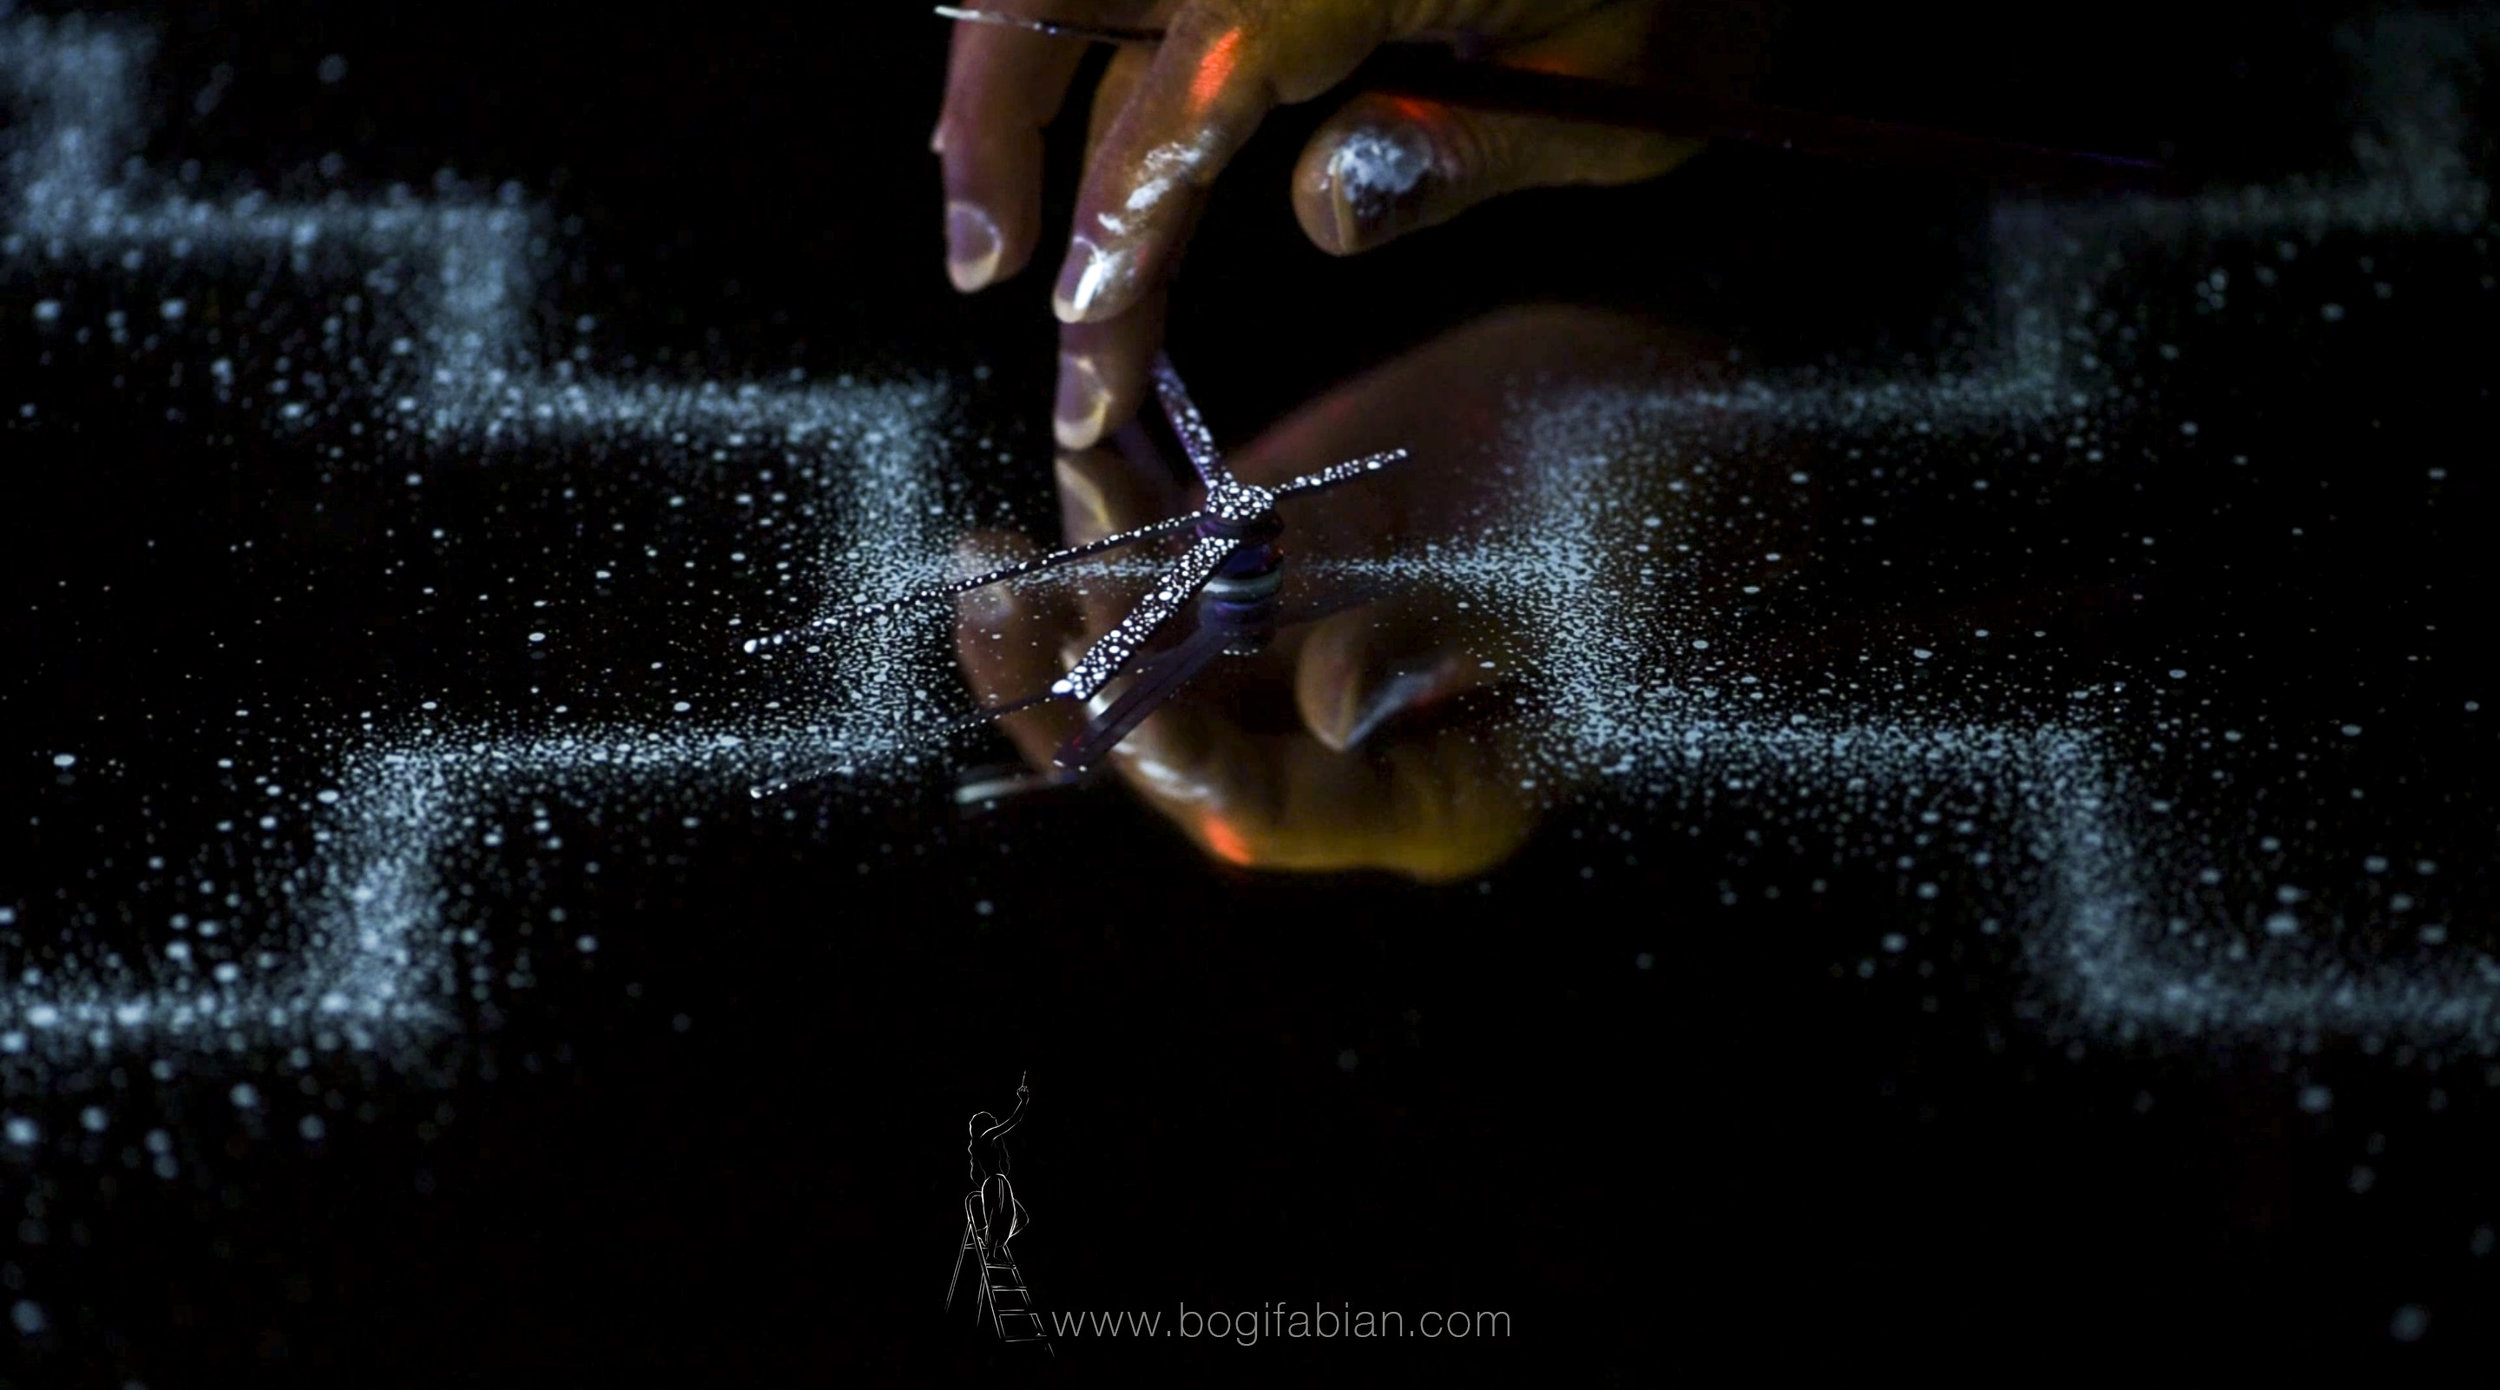 bogi Fabian UV ultraviolet glow in the dark  moon universe dream